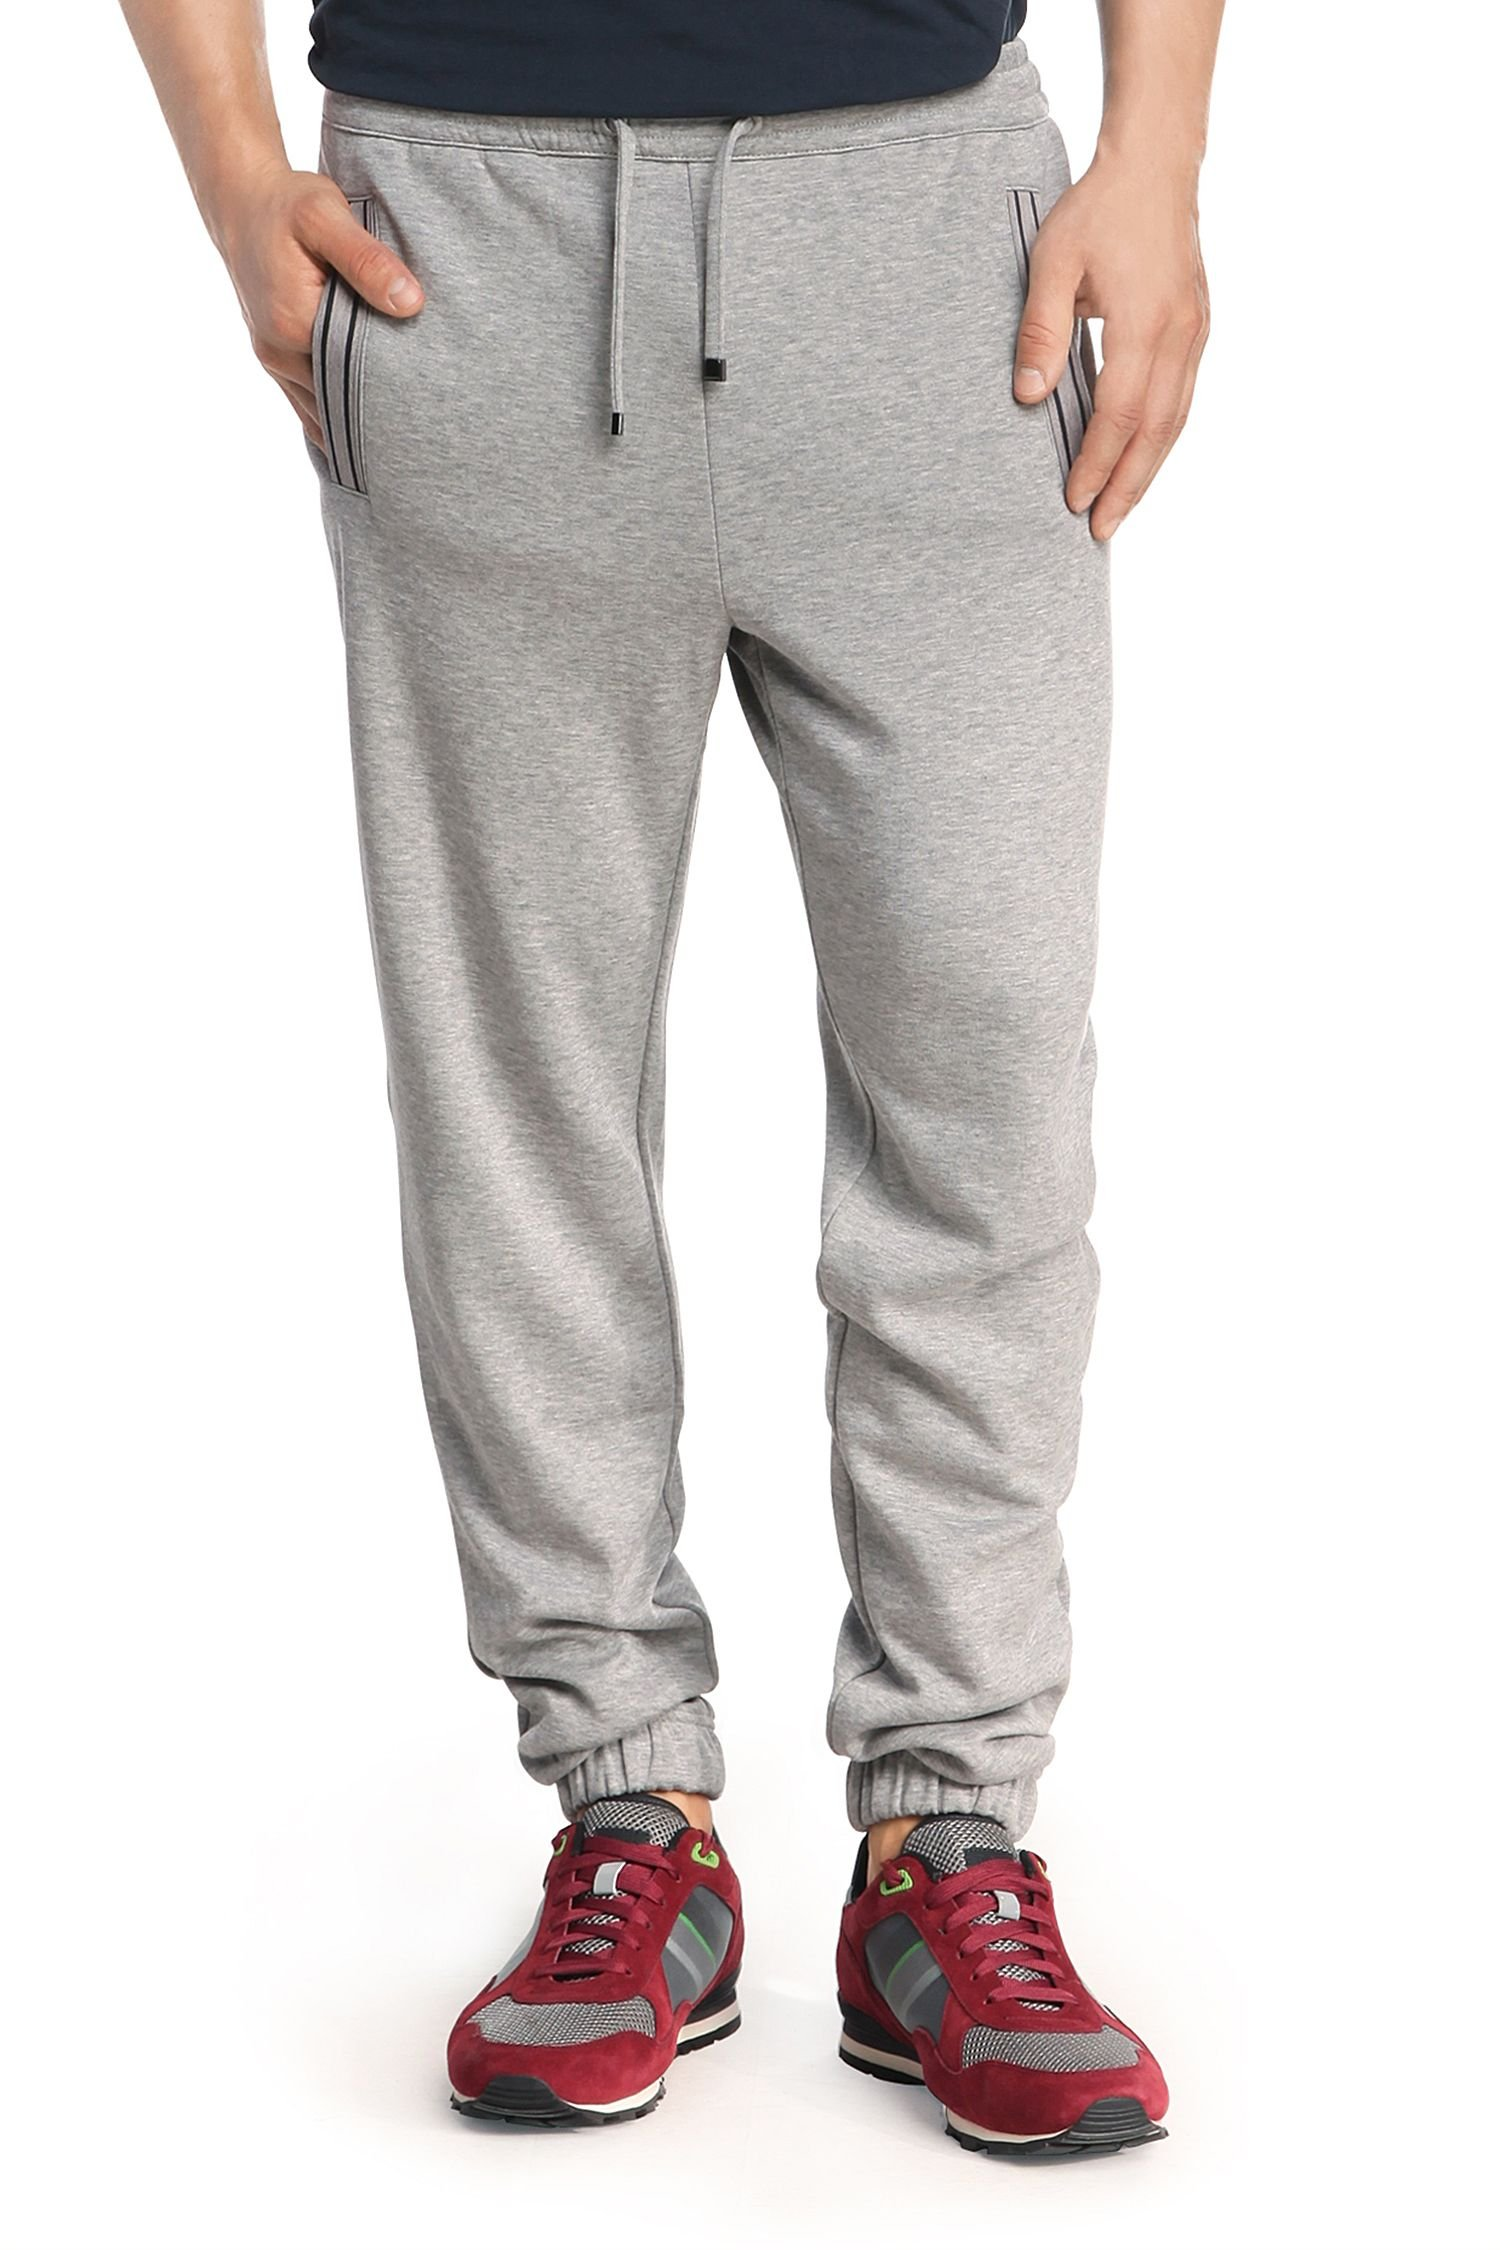 Hugo Boss Men's Hadiko Solid Gray Stretch Cotton Blend Track Jogging Sweat Pants (XL)